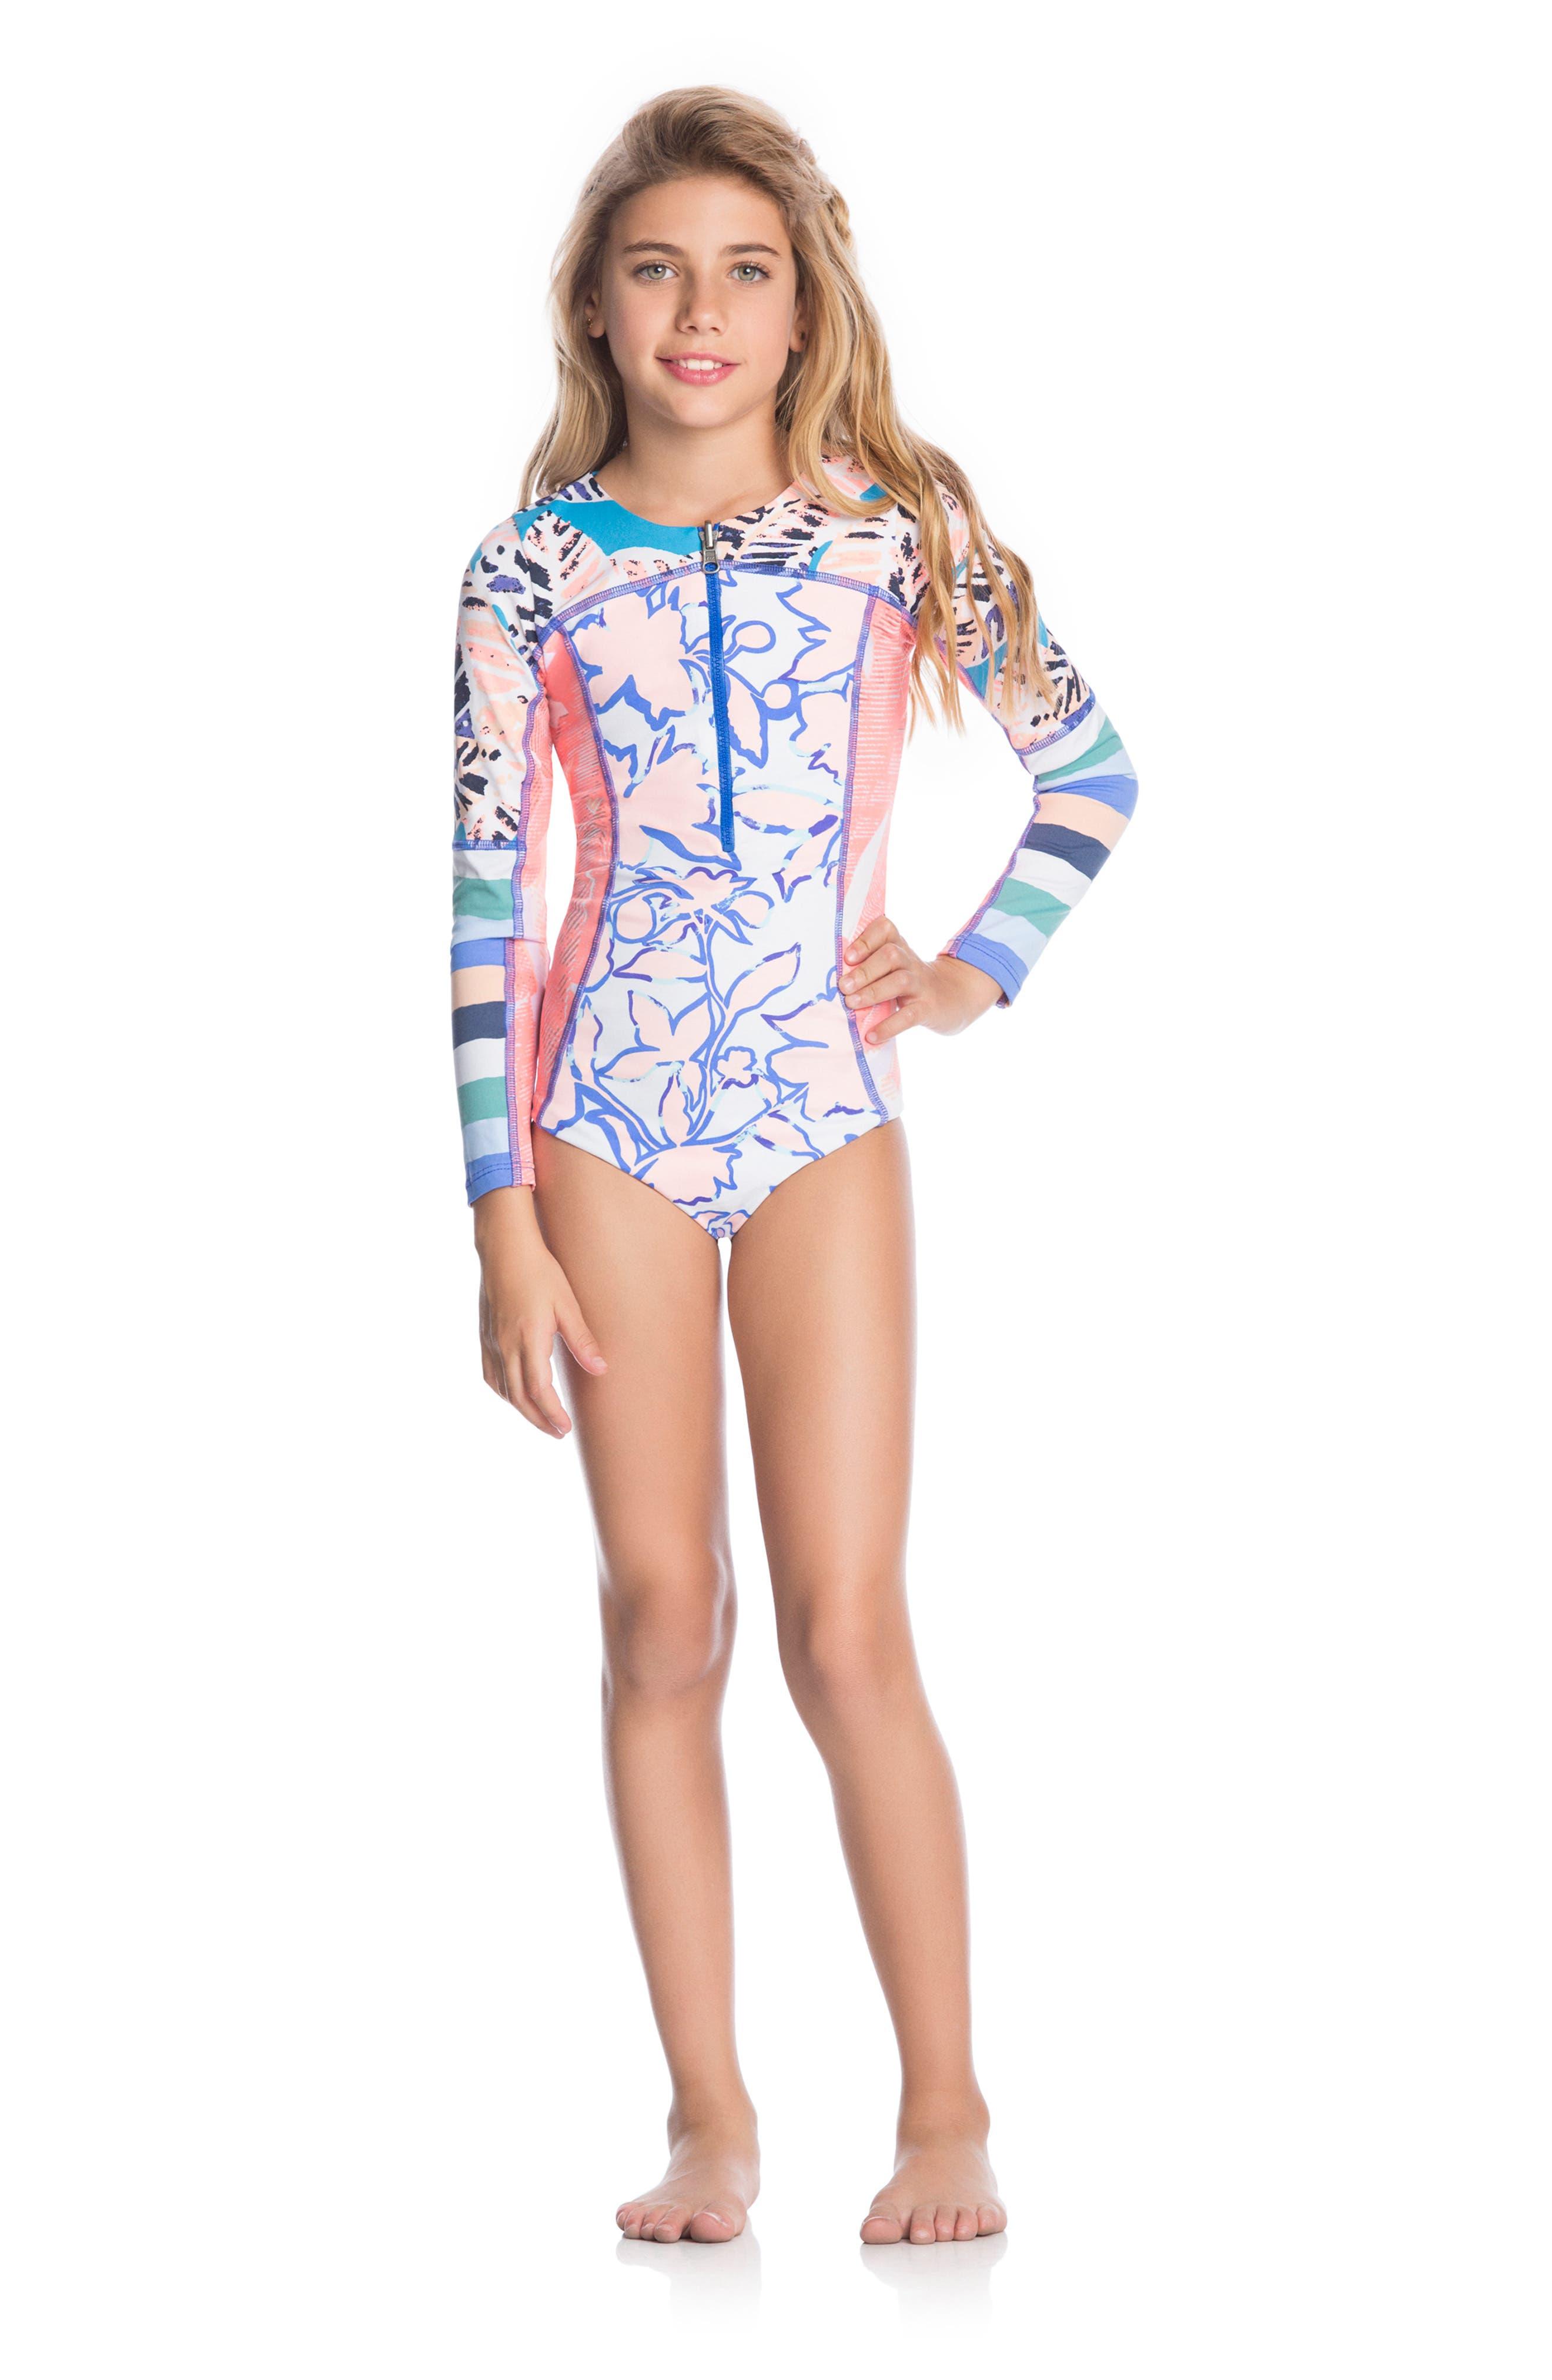 Ocean Joiness Reversible One-Piece Rashguard Swimsuit,                             Alternate thumbnail 2, color,                             MULTICOLOR